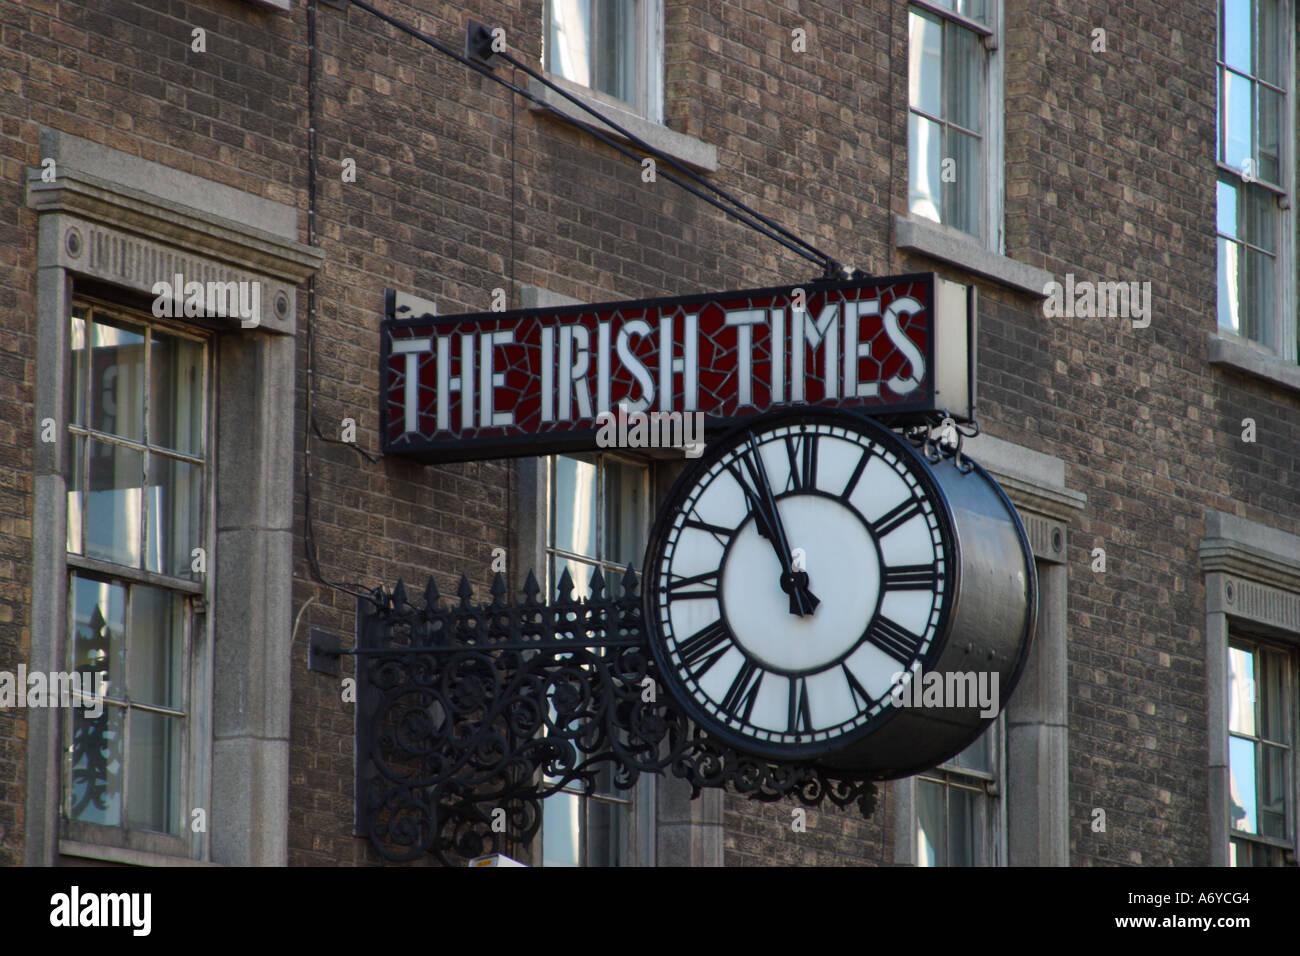 The irish times clock dublin ireland stock photo royalty free image 6670339 alamy - Irish times office dublin ...